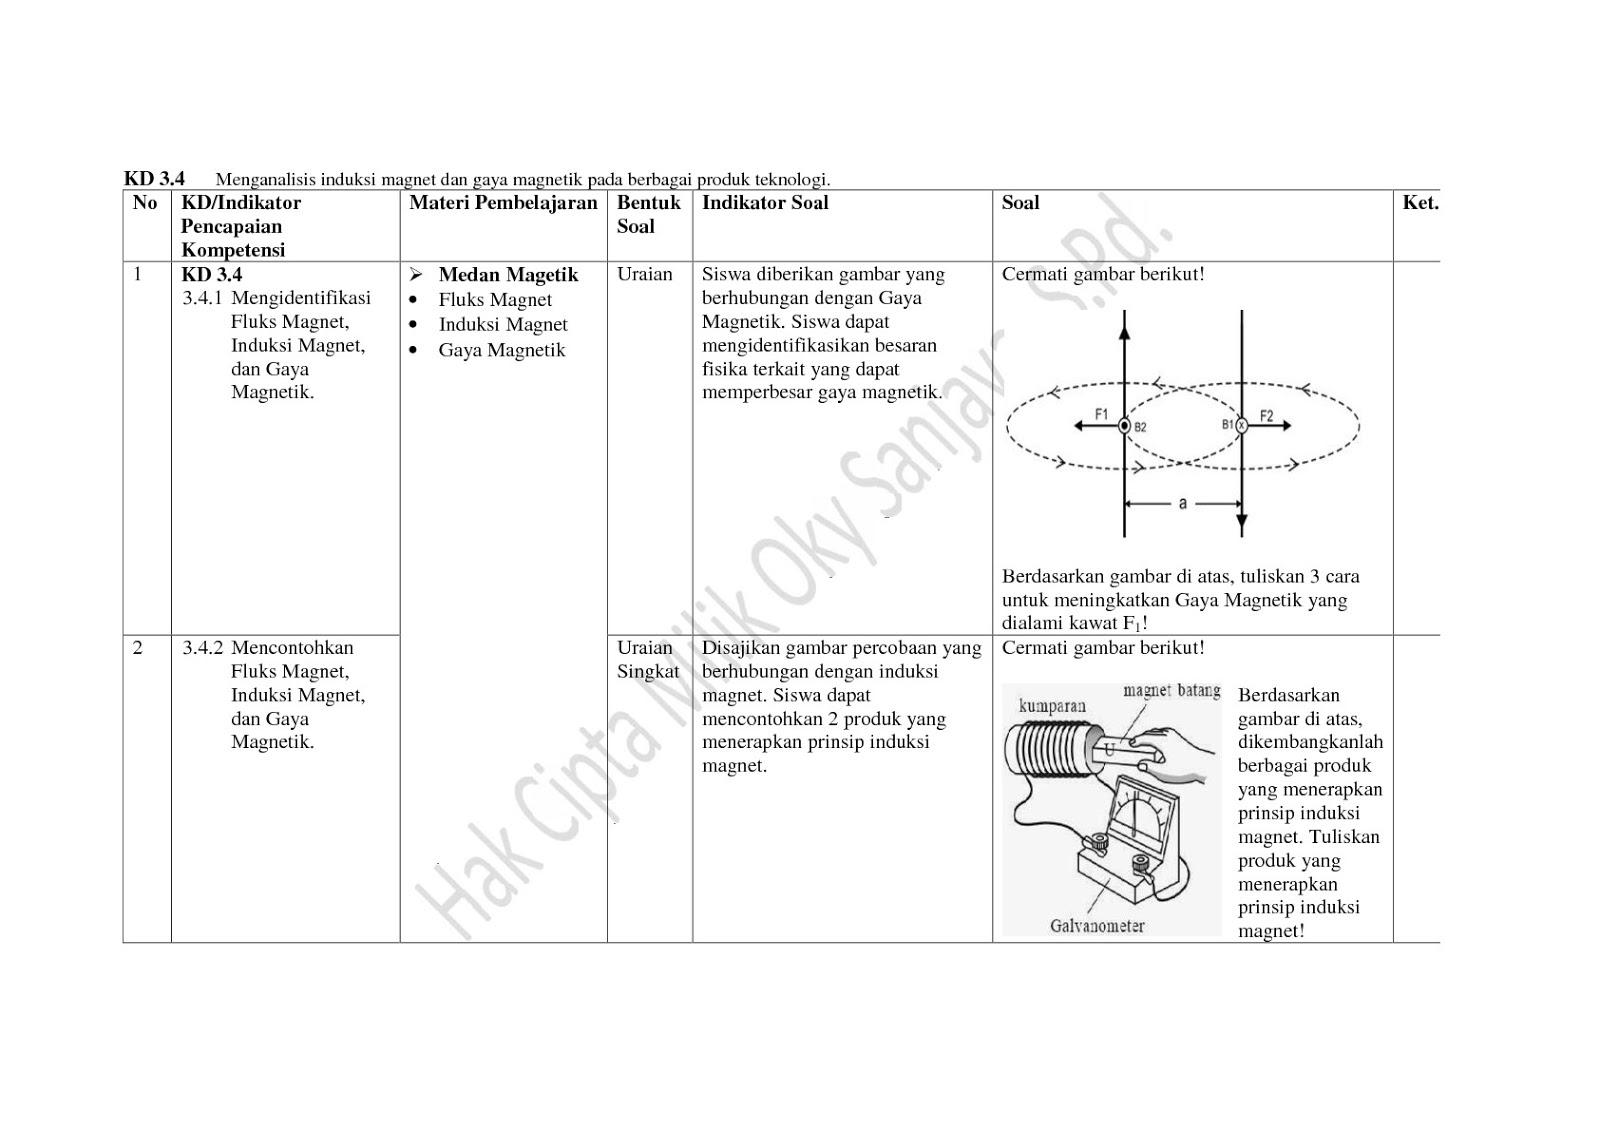 Kisi Kisi Soal Kelas V Kurikulum 2013 Soal Uas Pkn Kelas Tahun Soal Uas Pkn Kelas Tahun Download